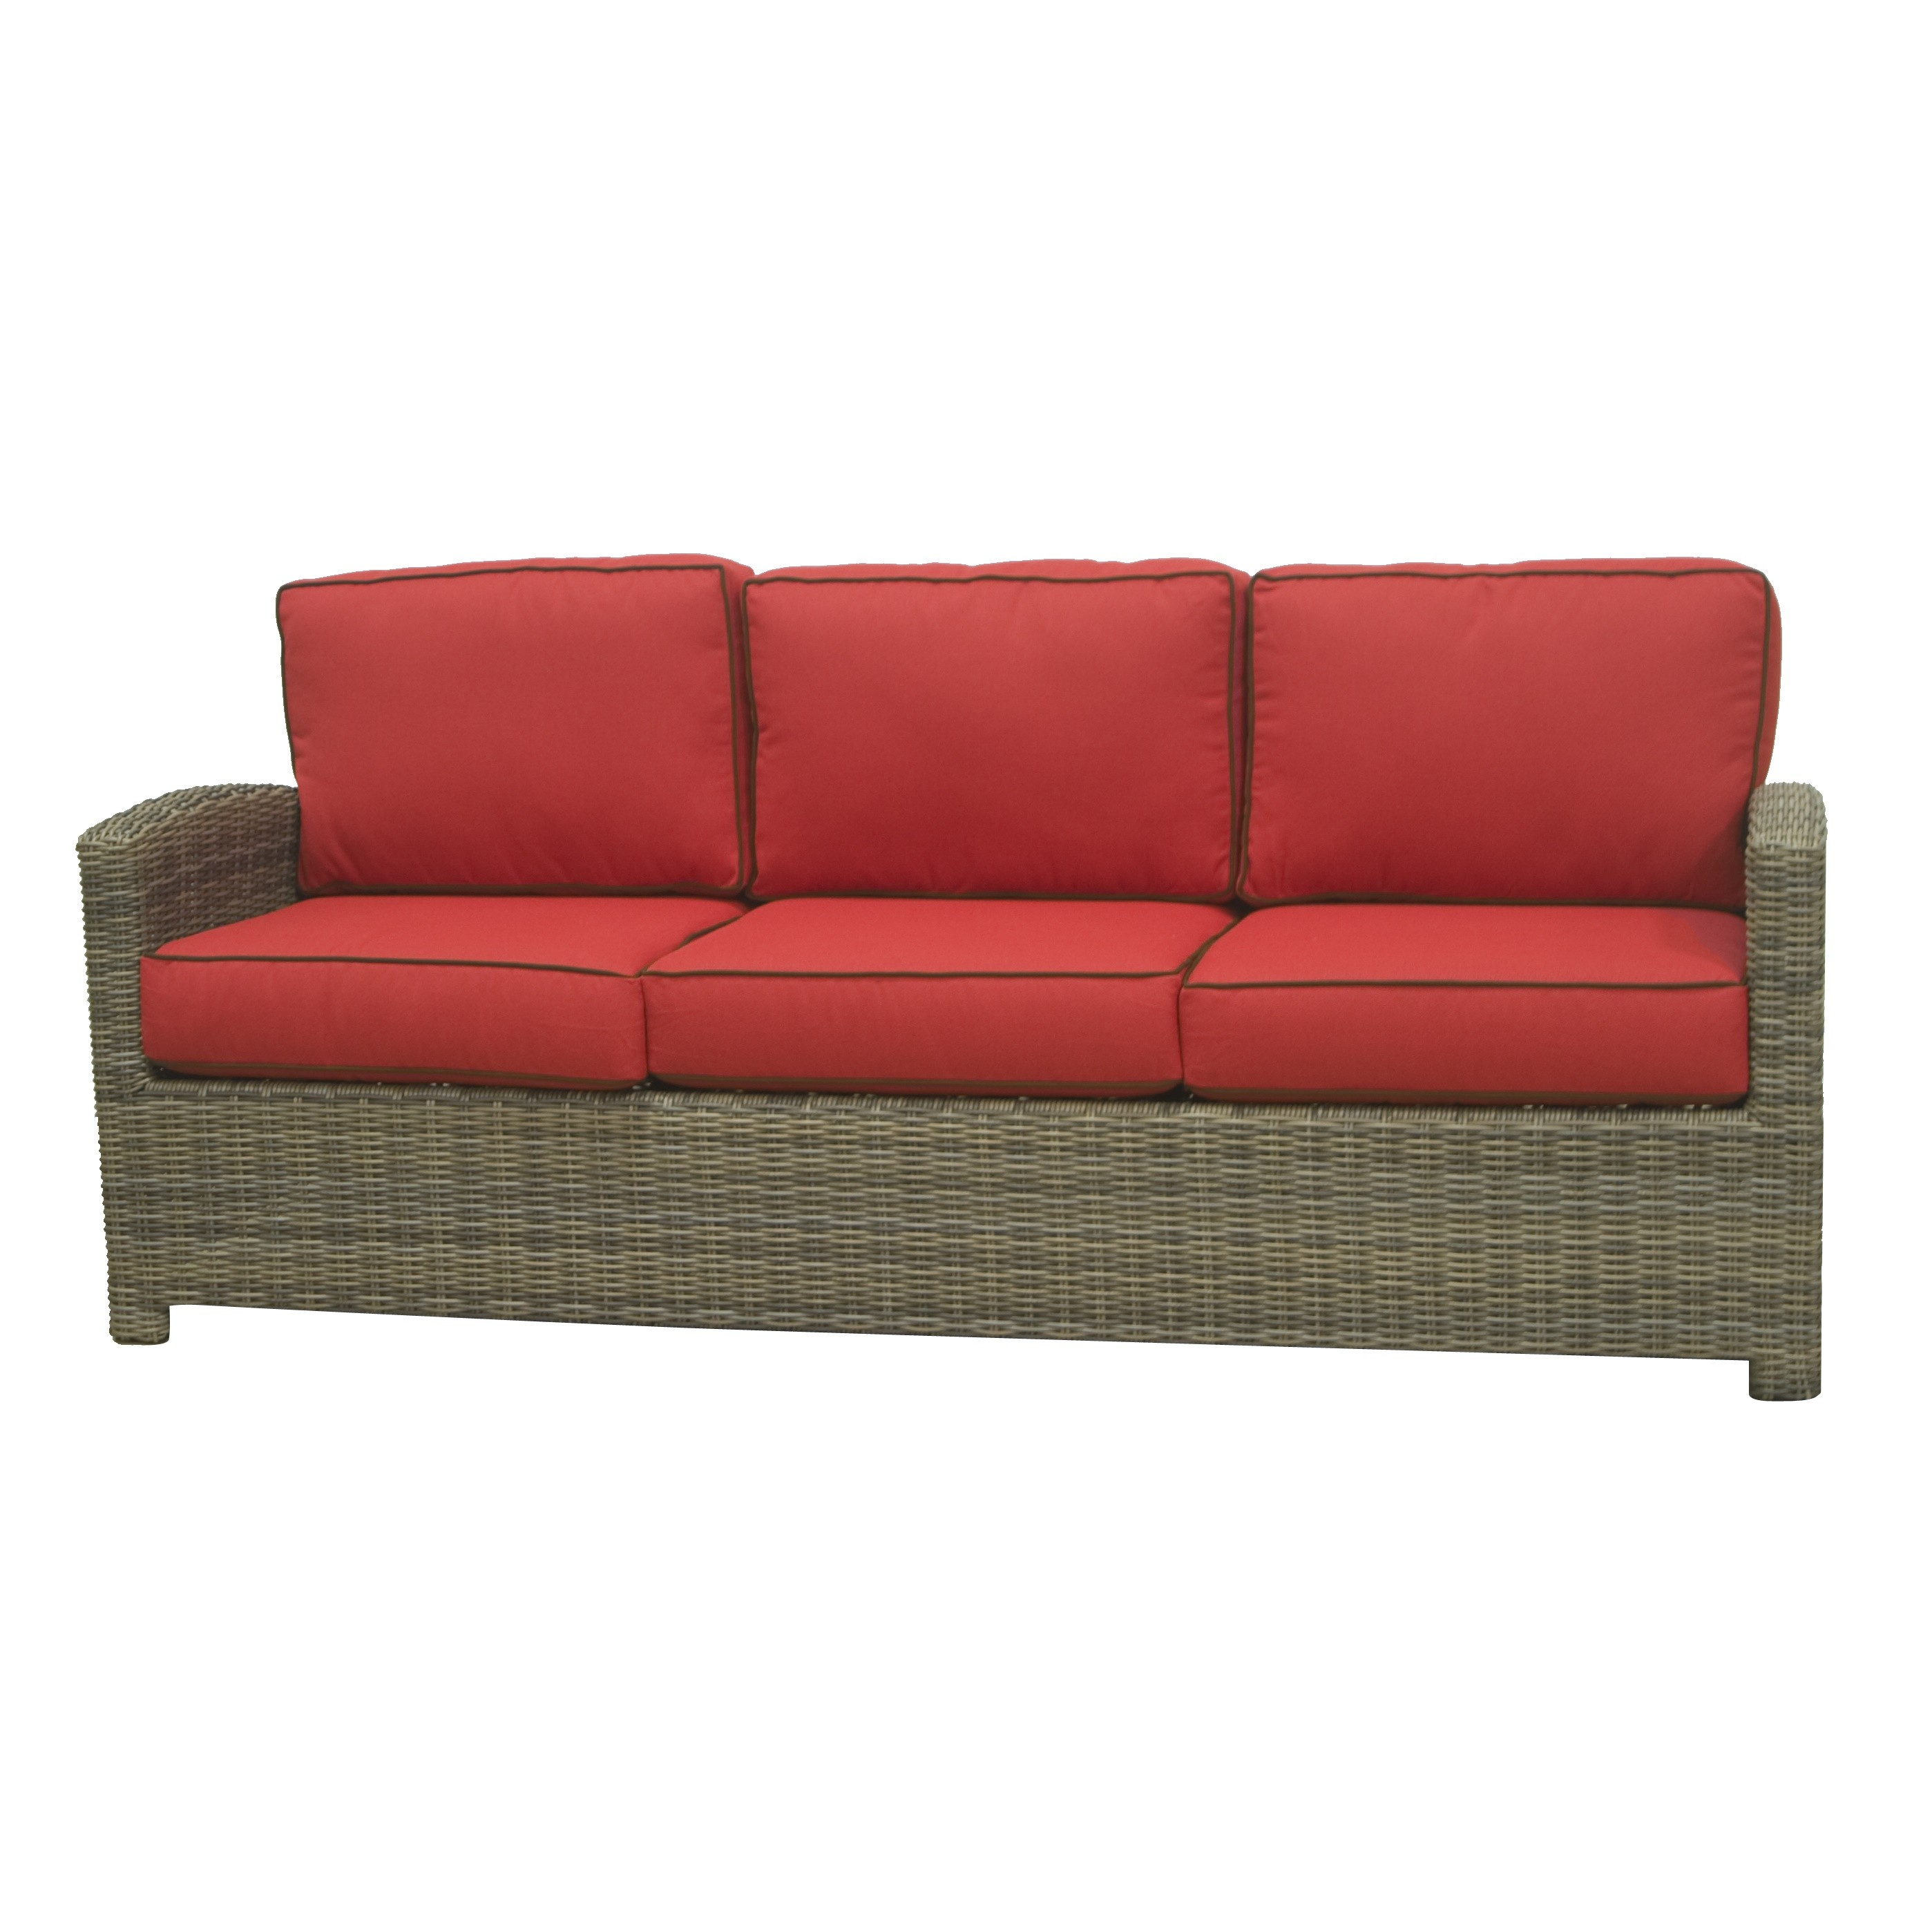 Bainbridge 3 Seater Sofa (Flagship Ruby w/ Canvas Bay Brown Welt)